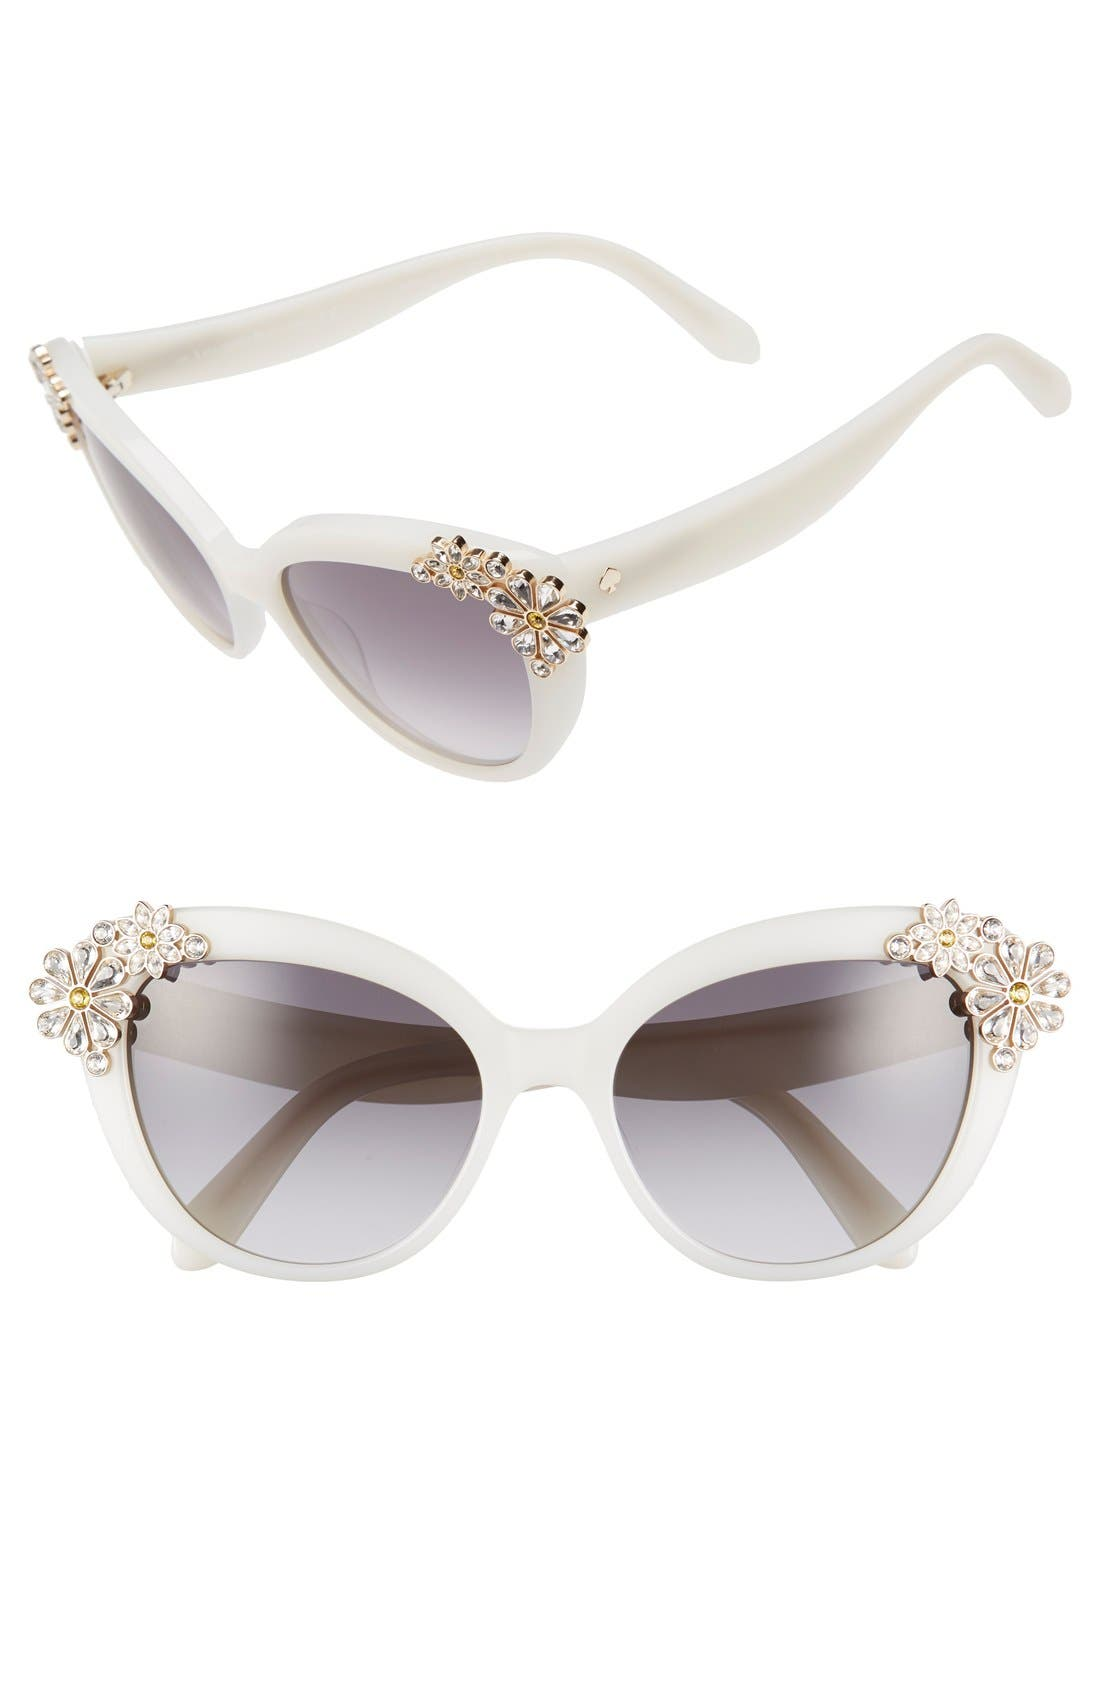 Main Image - kate spade new york 'karyna' 55mm cat eye sunglasses